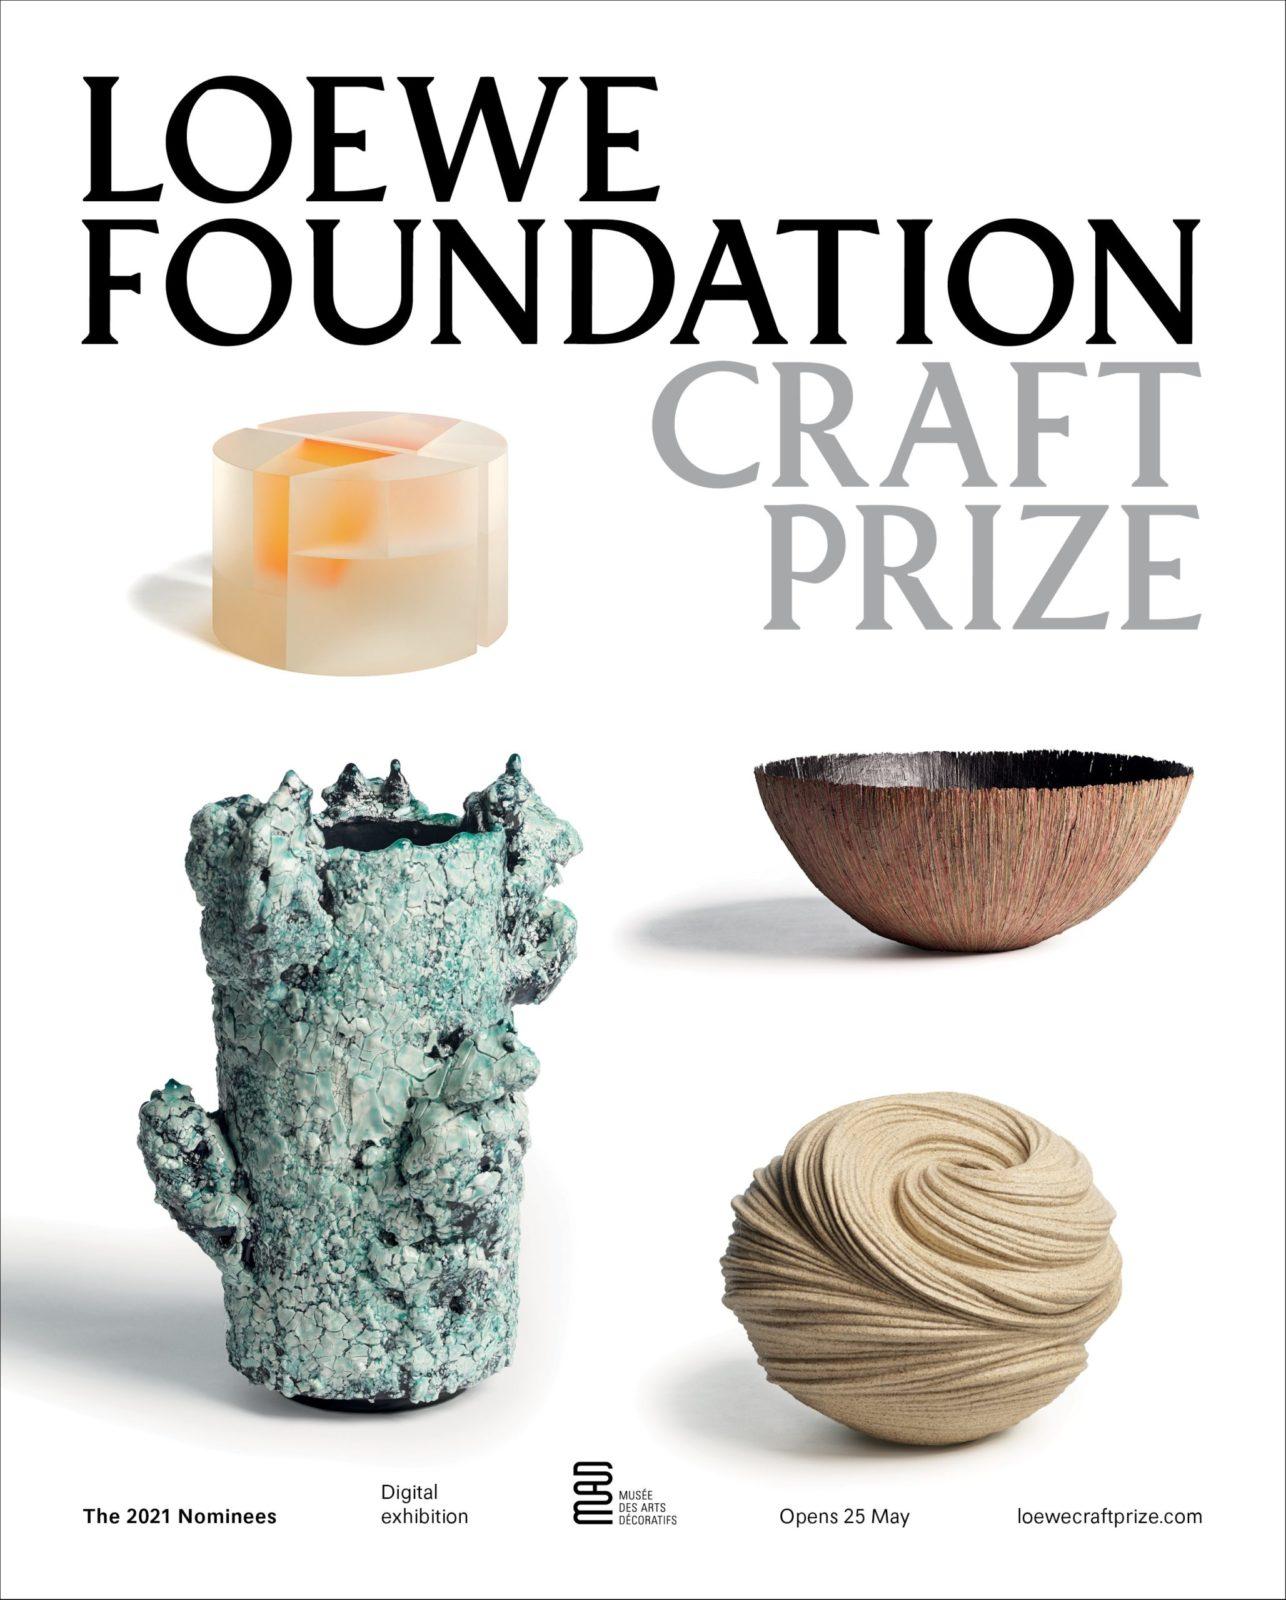 loewe foundation craft prize